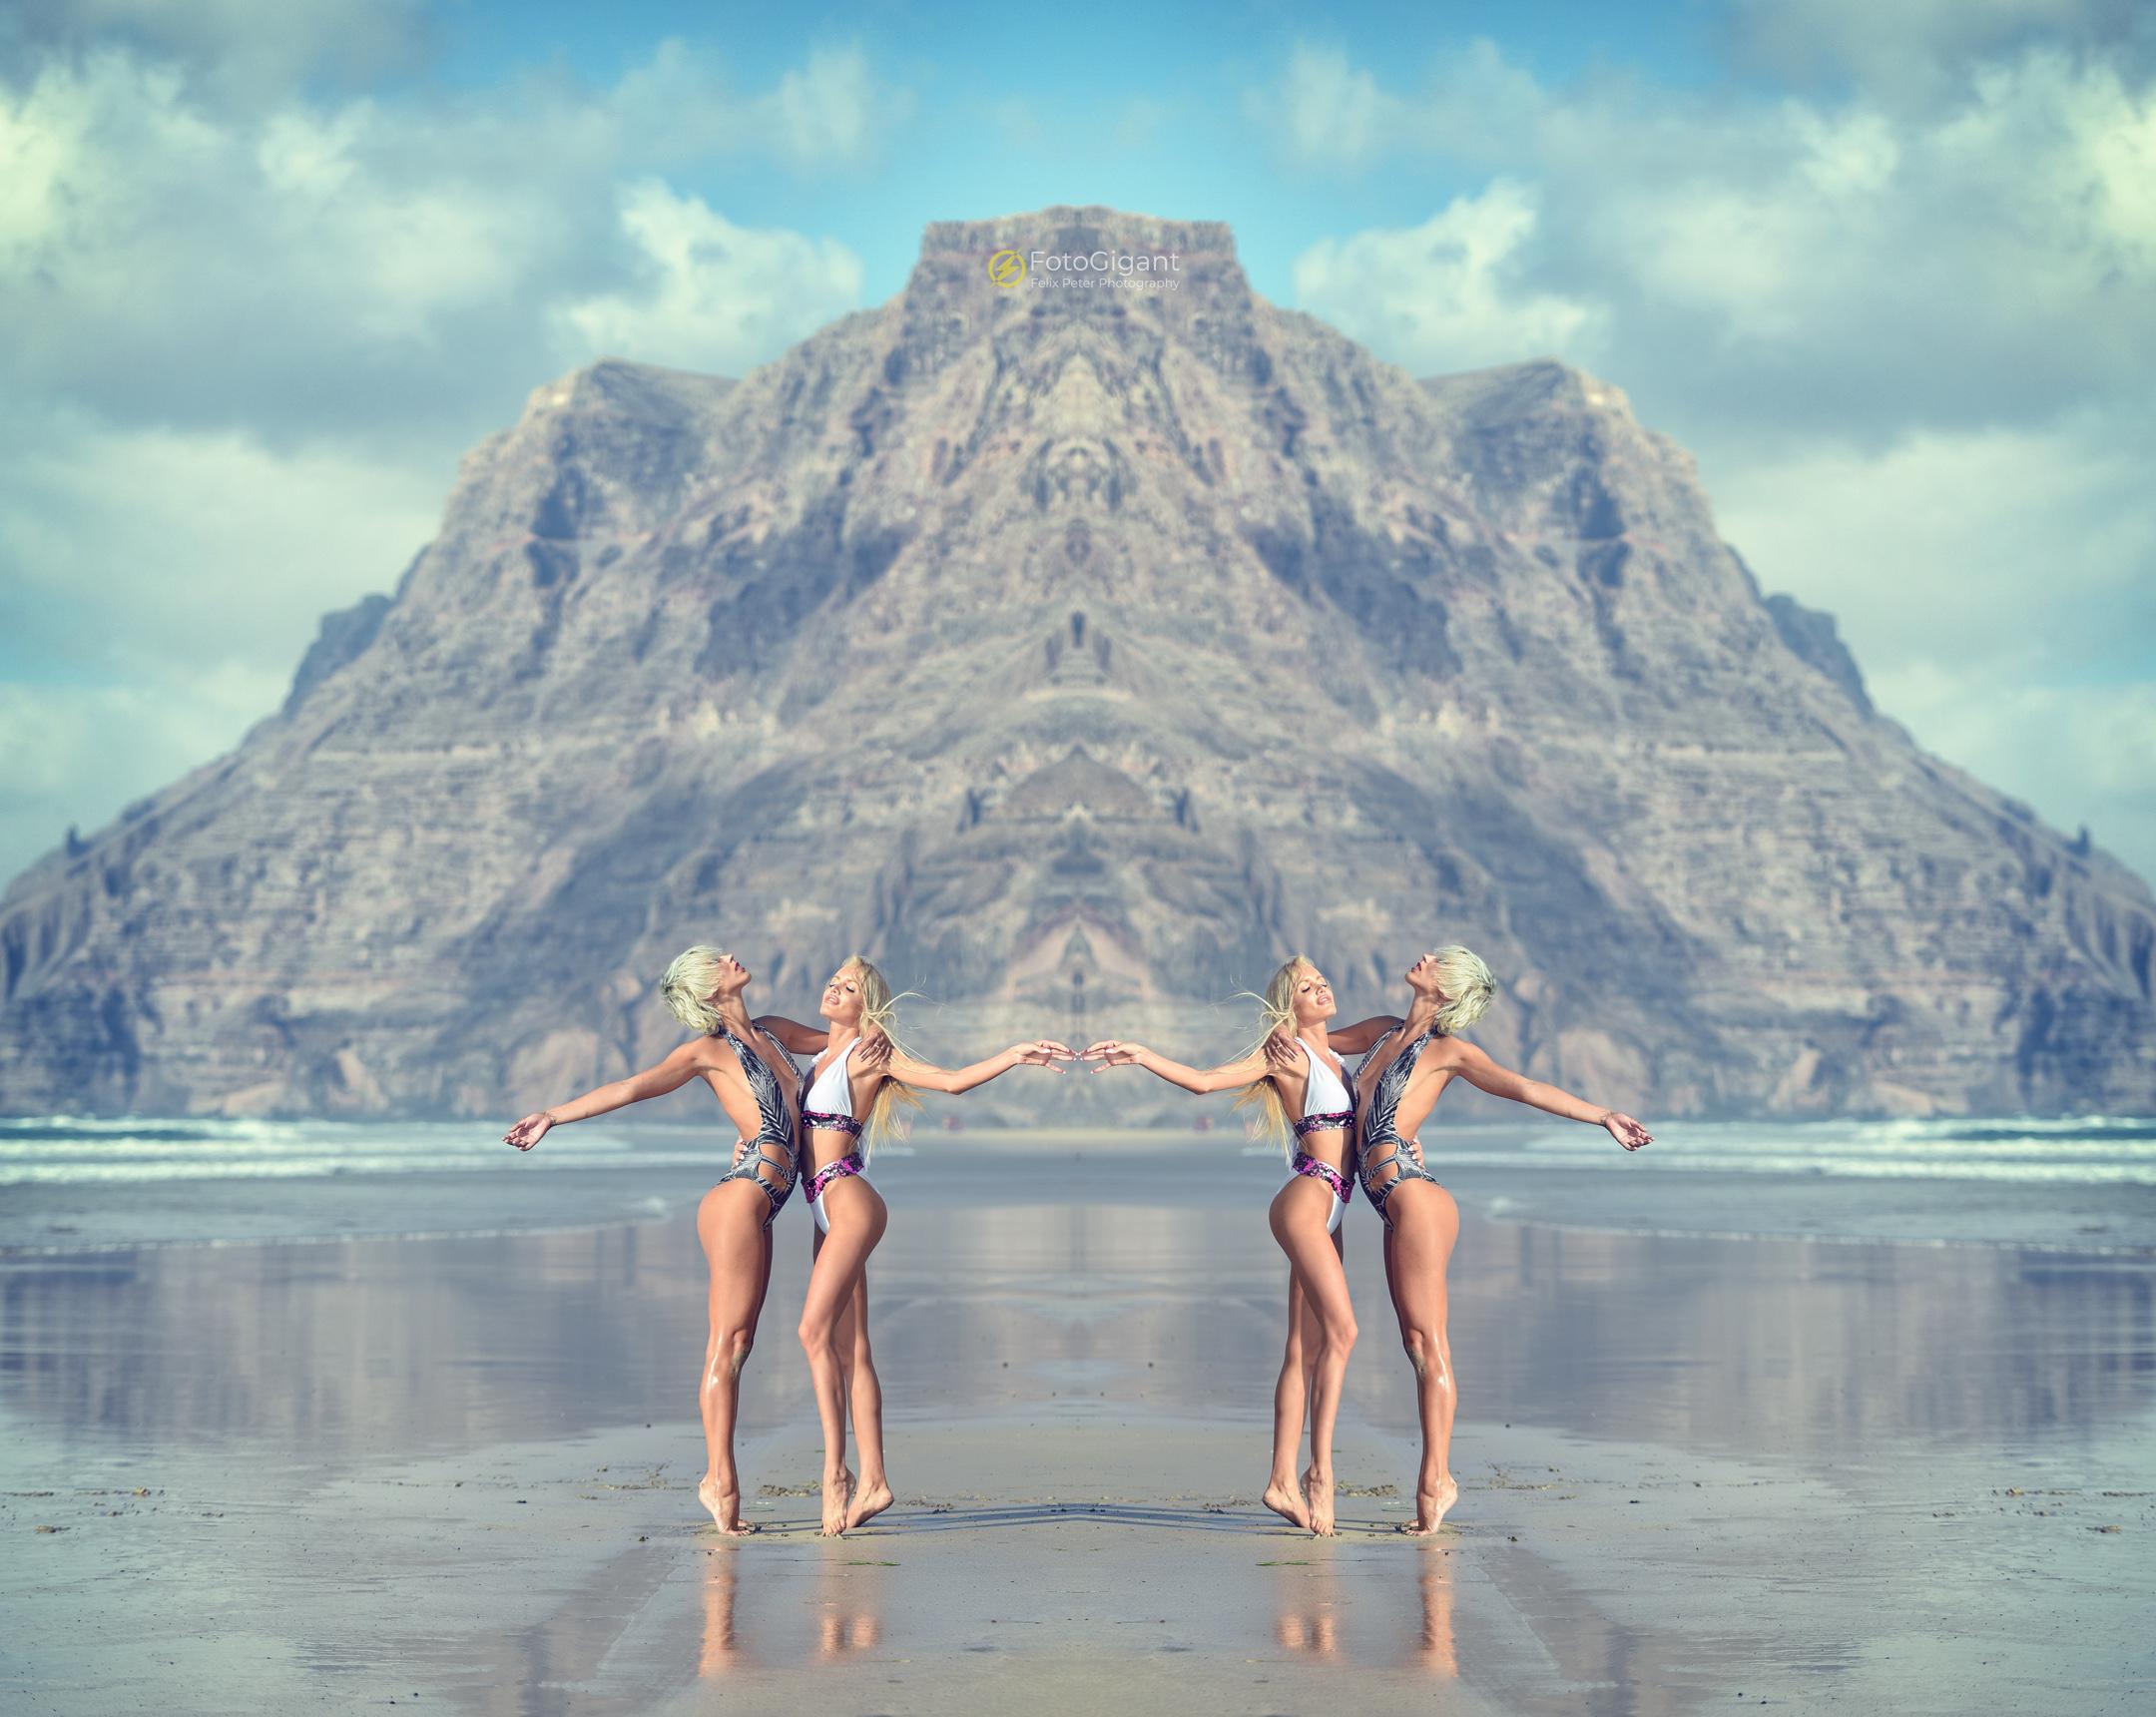 Lanzarote_NudeArt_Photoworkshop_FotoGigant_Switzerland_24.jpg